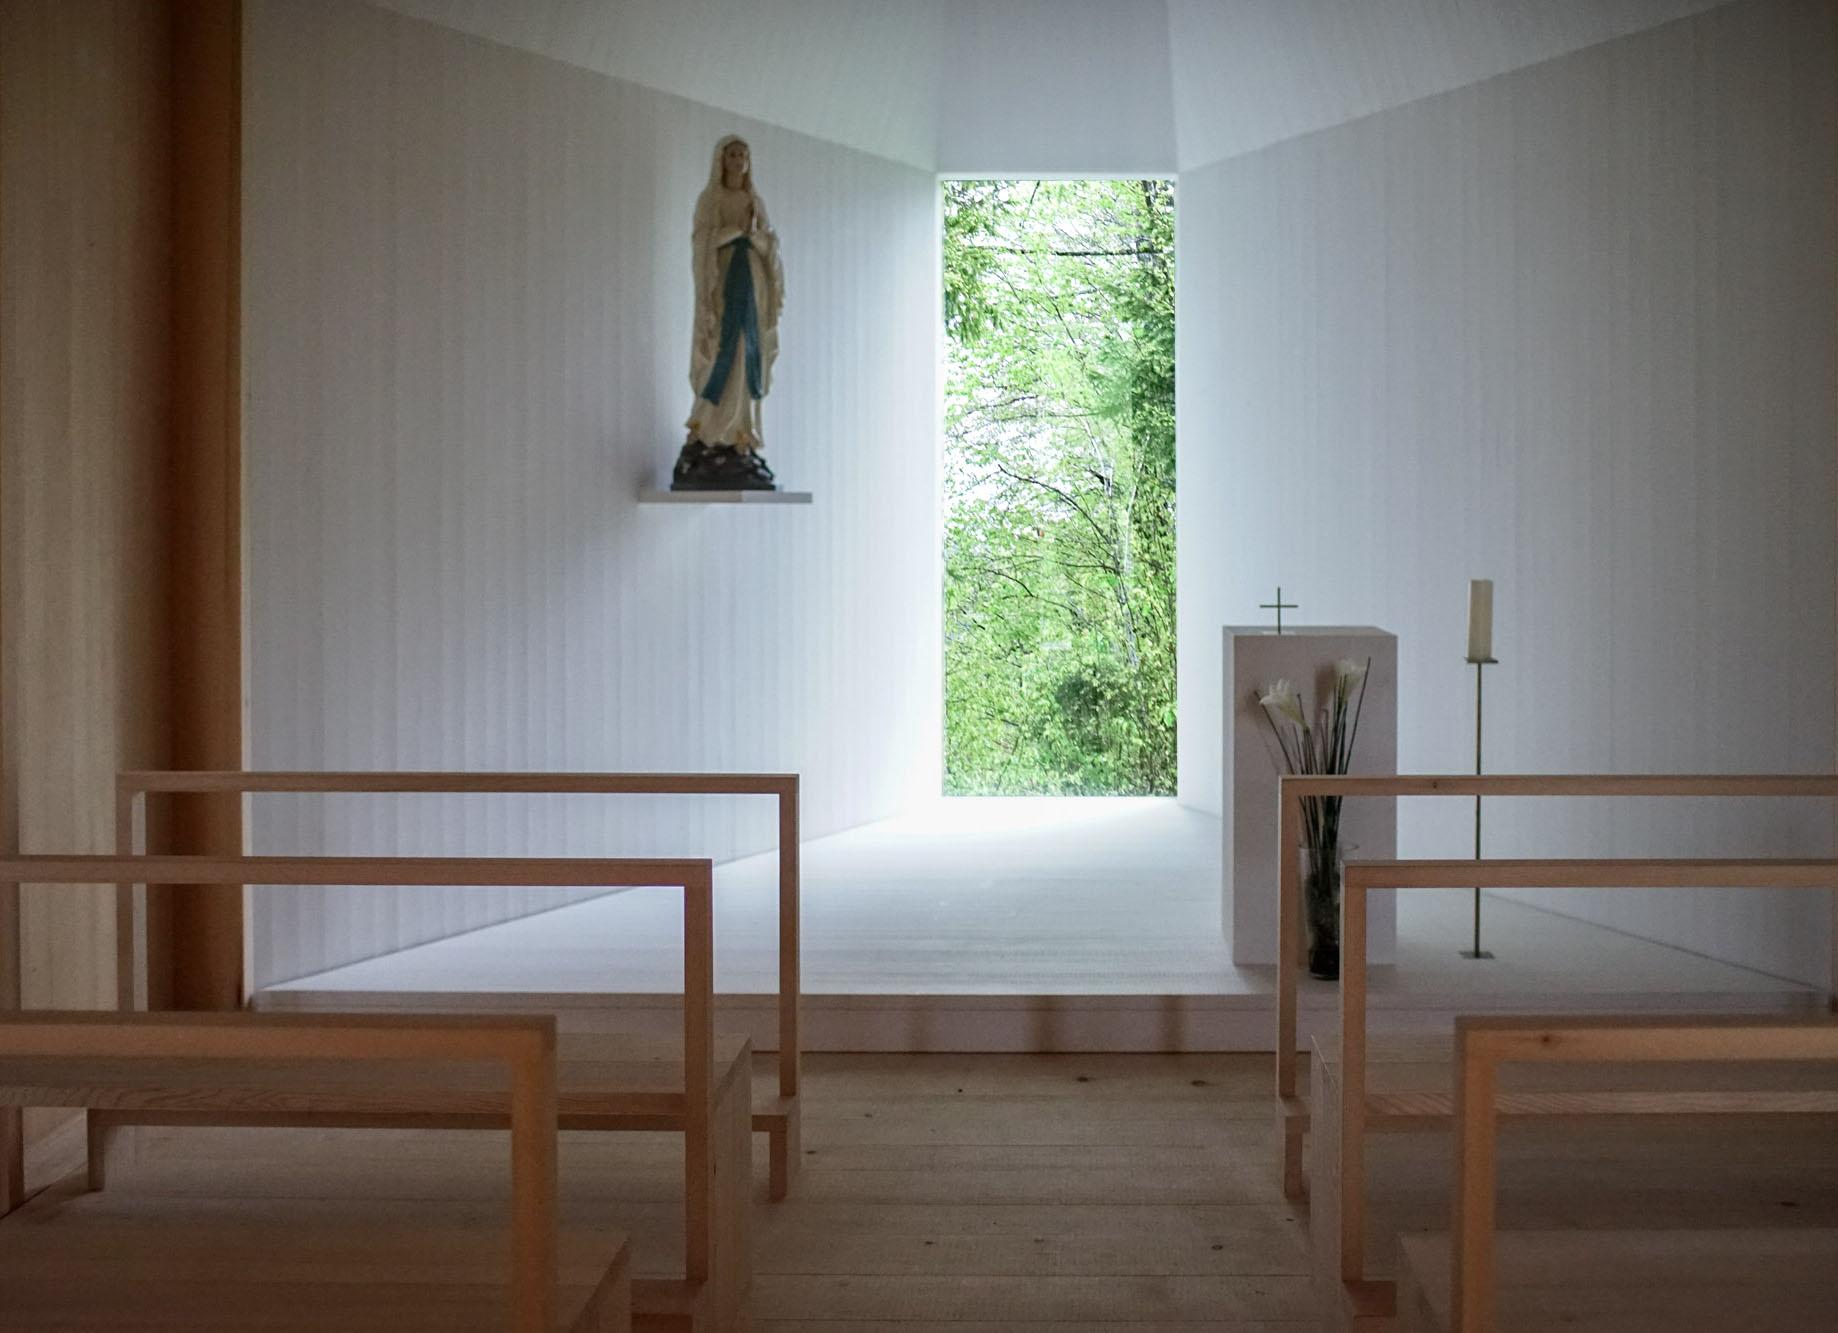 salgenreute-chapel-bernardo-bader-photo-jean-nicolas-lechat-urbantyper-abside